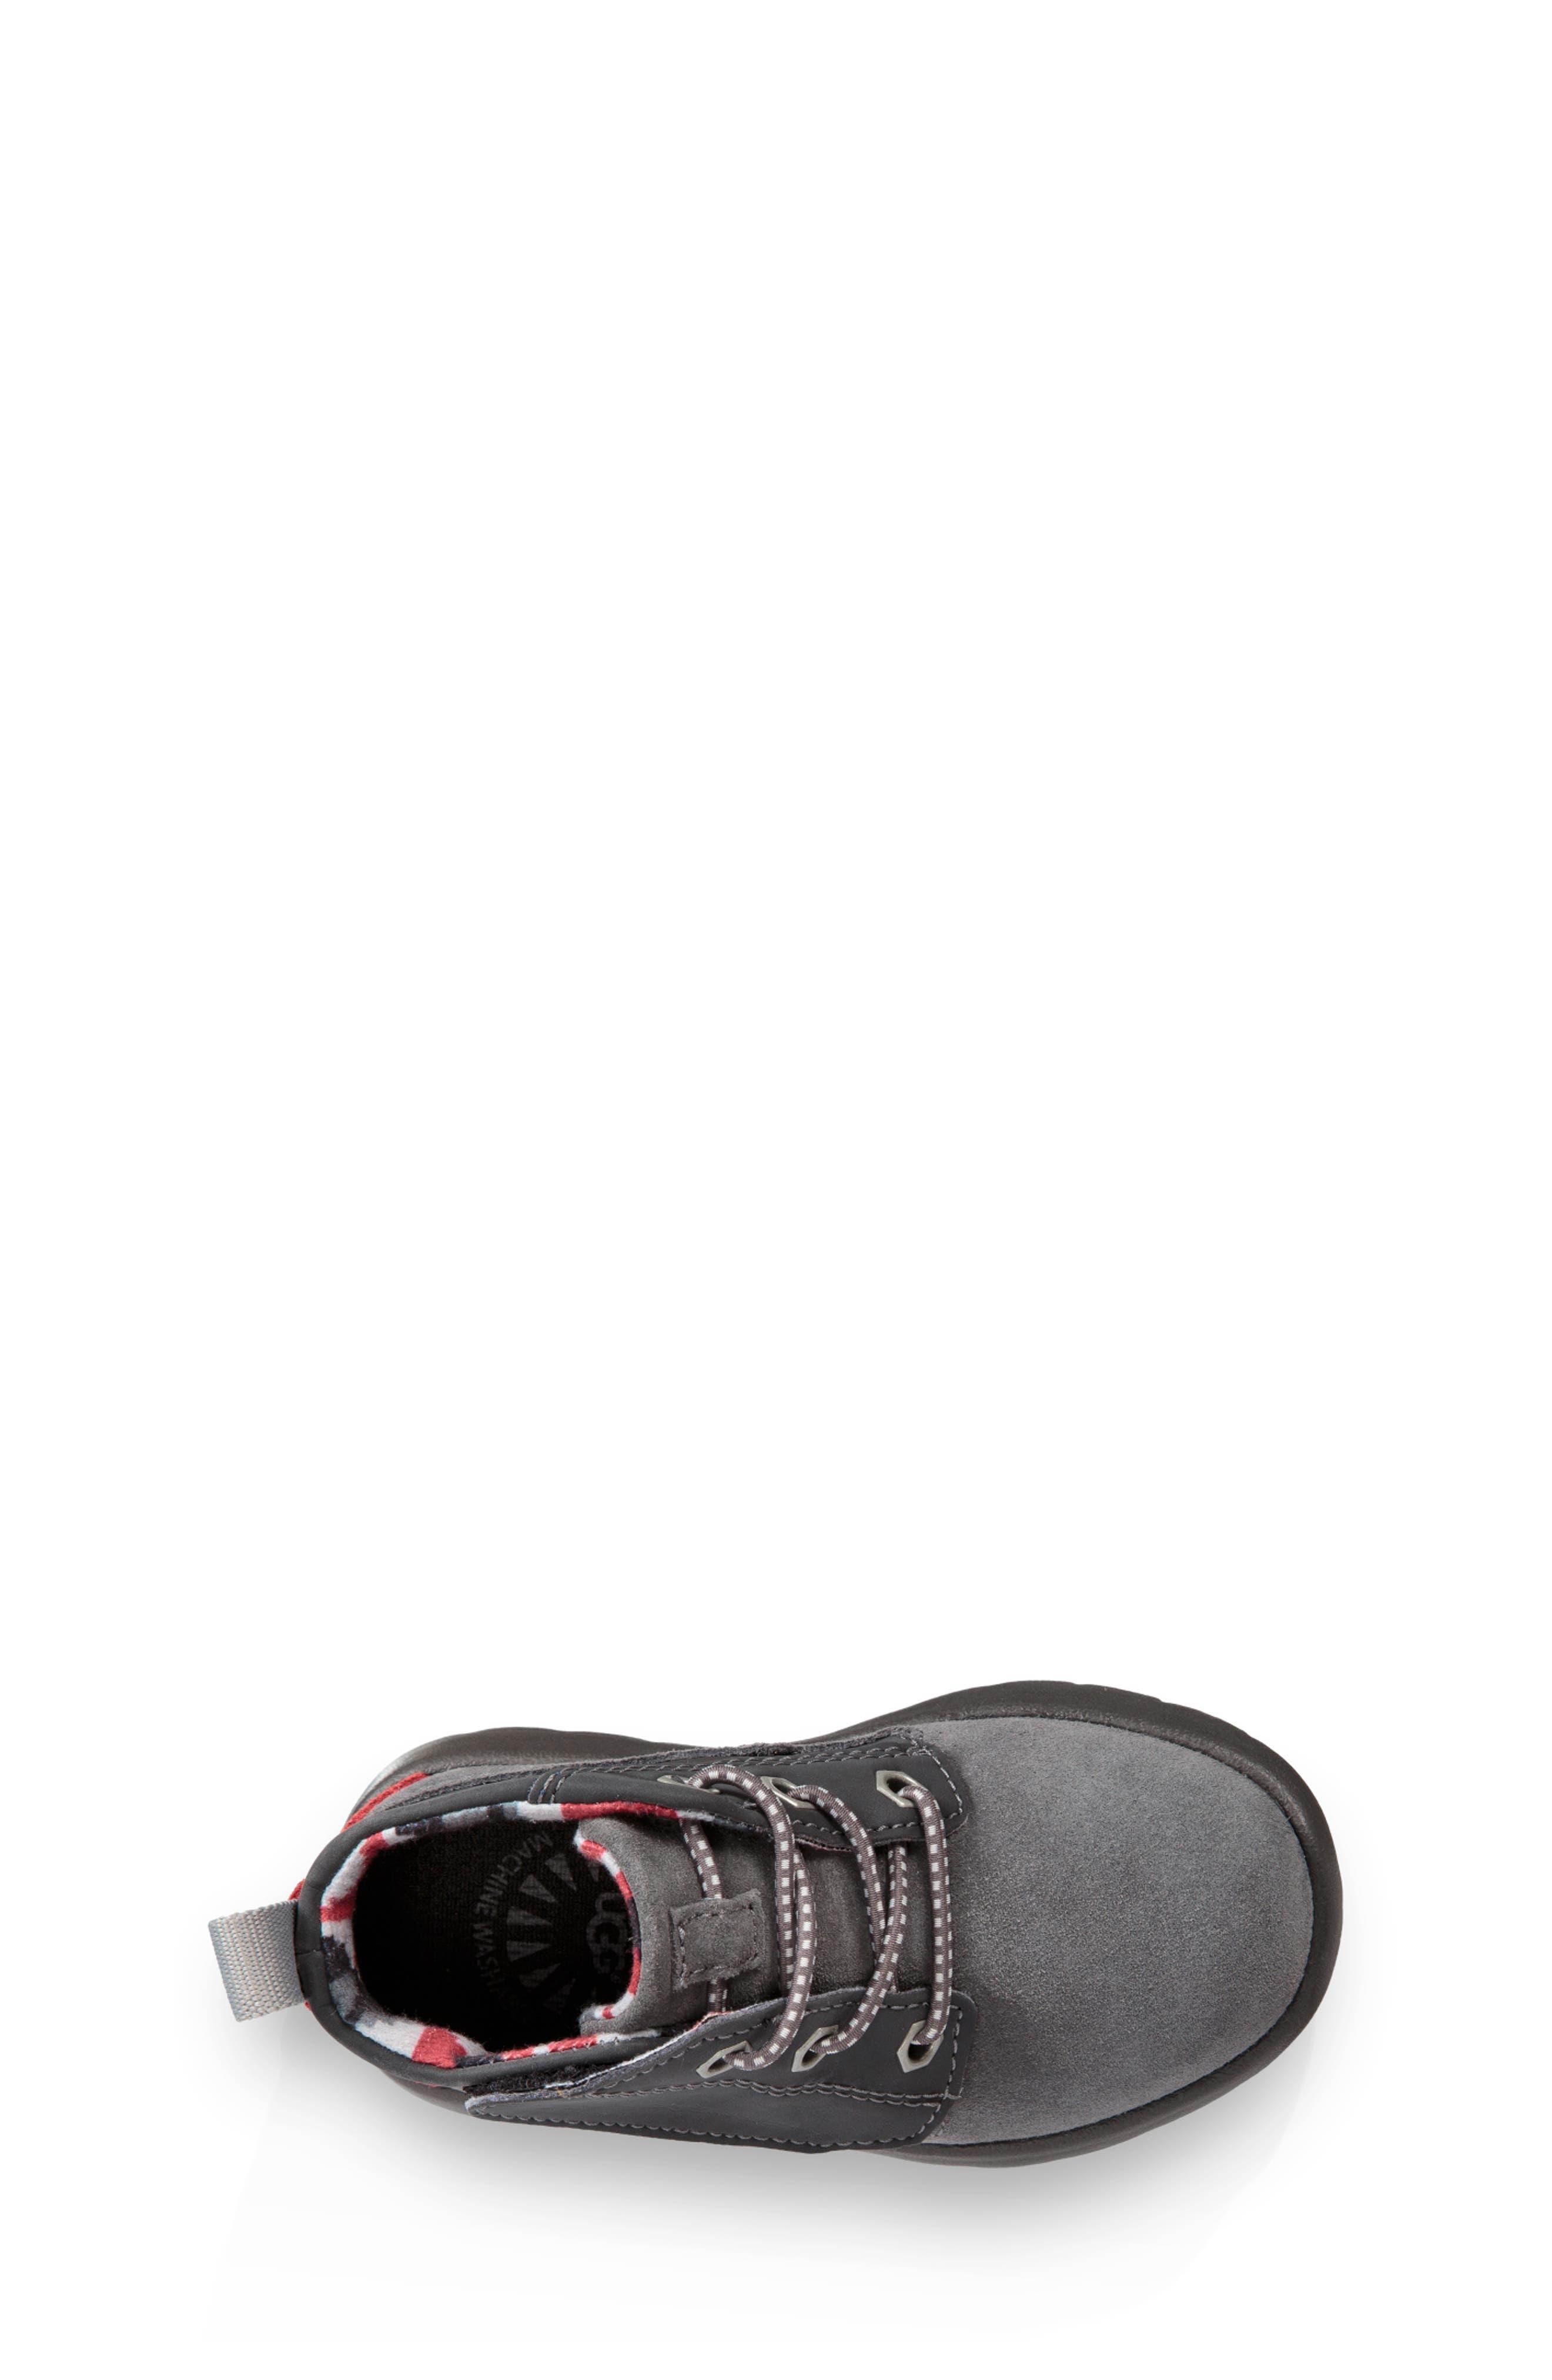 Canoe Chukka Sneaker,                             Alternate thumbnail 4, color,                             GREY / BLACK